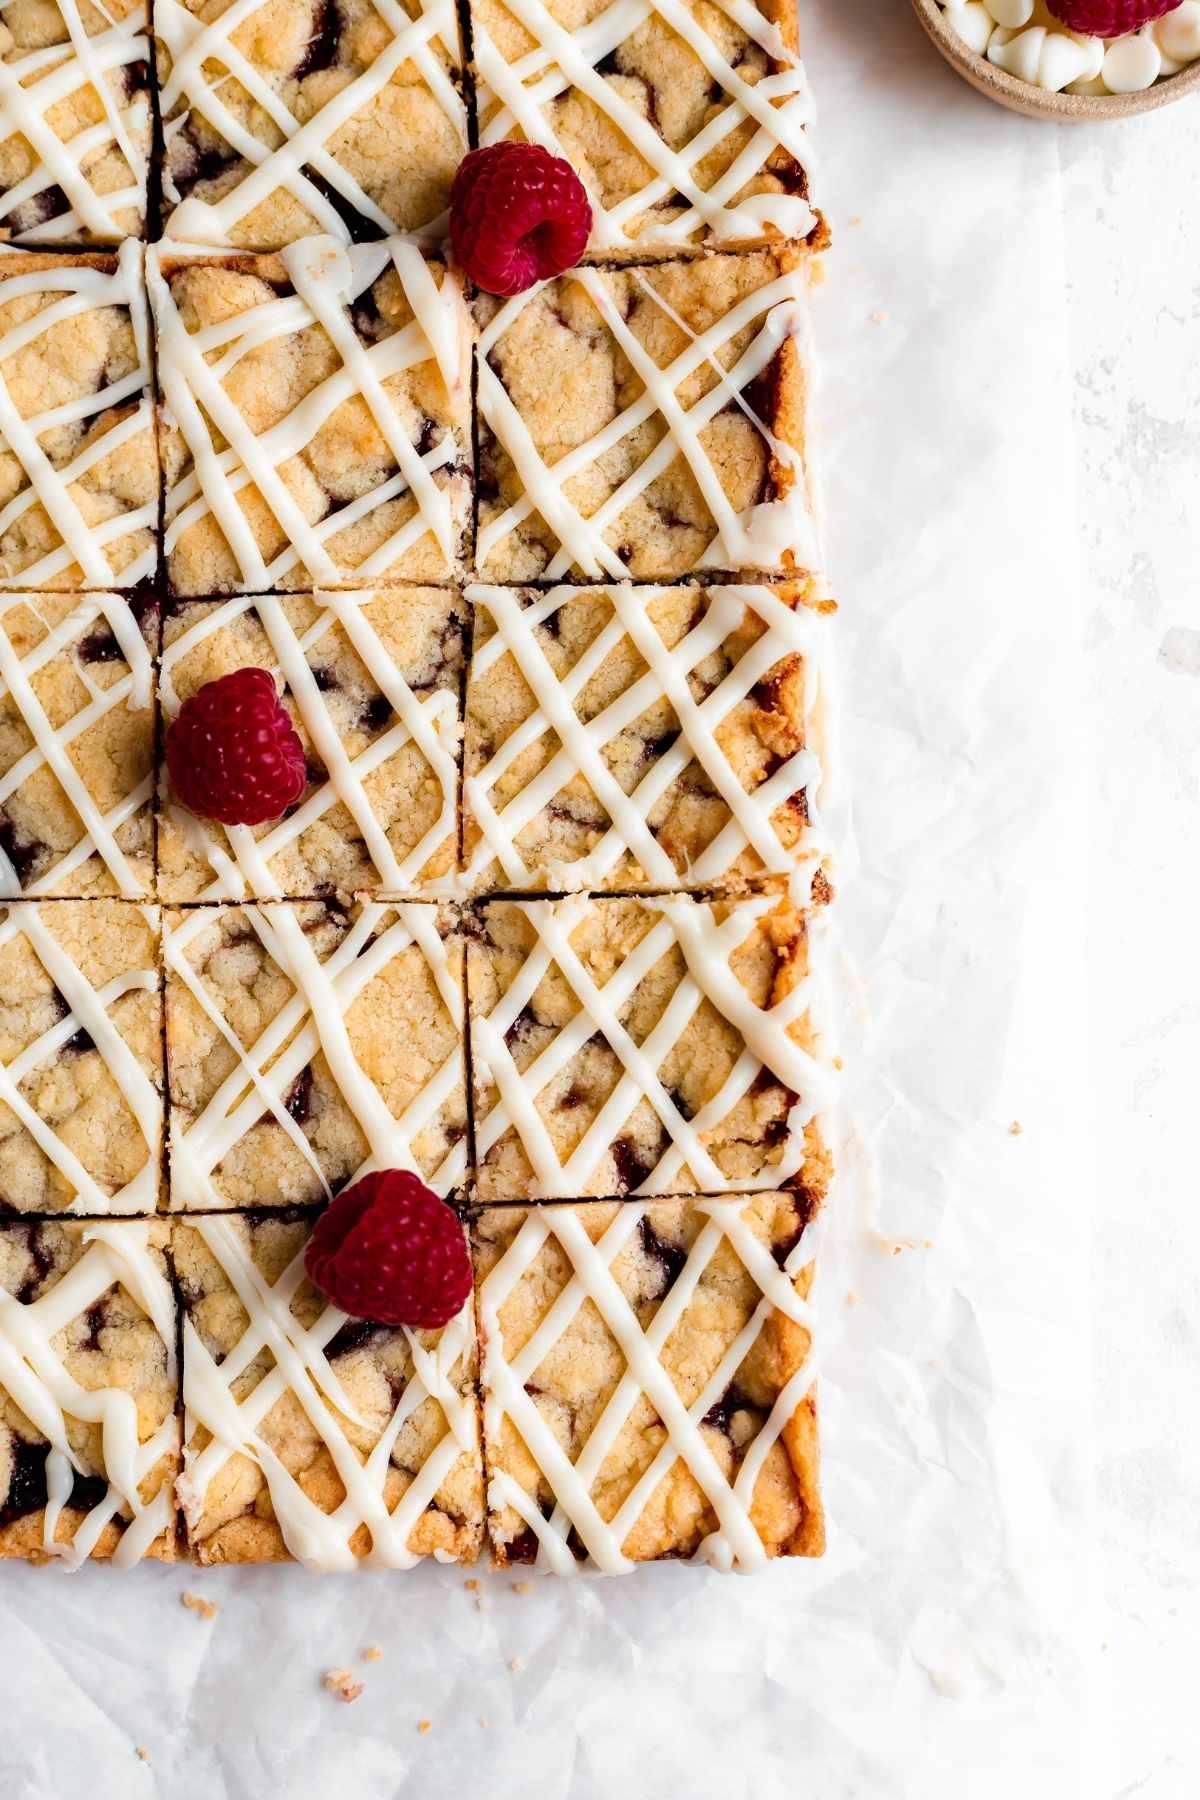 White Chocolate Raspberry Shortbread Bars sliced on parchment with fresh raspberry garnish